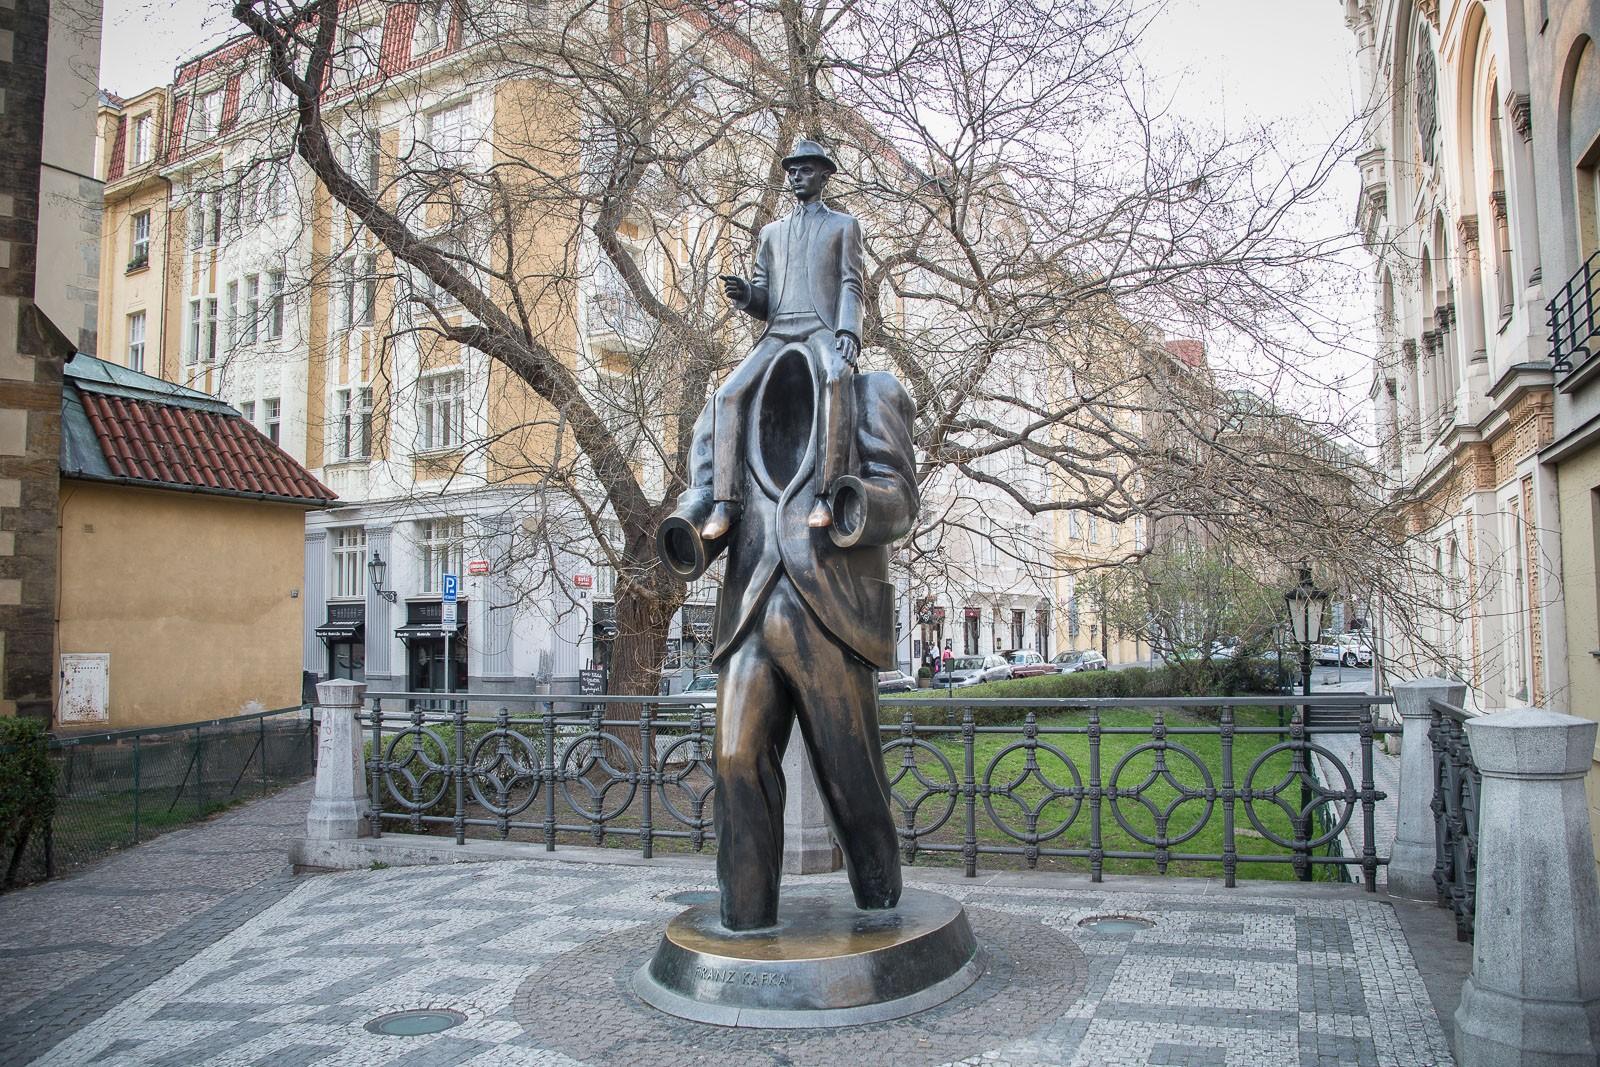 Franz Kafka Monument in Prag